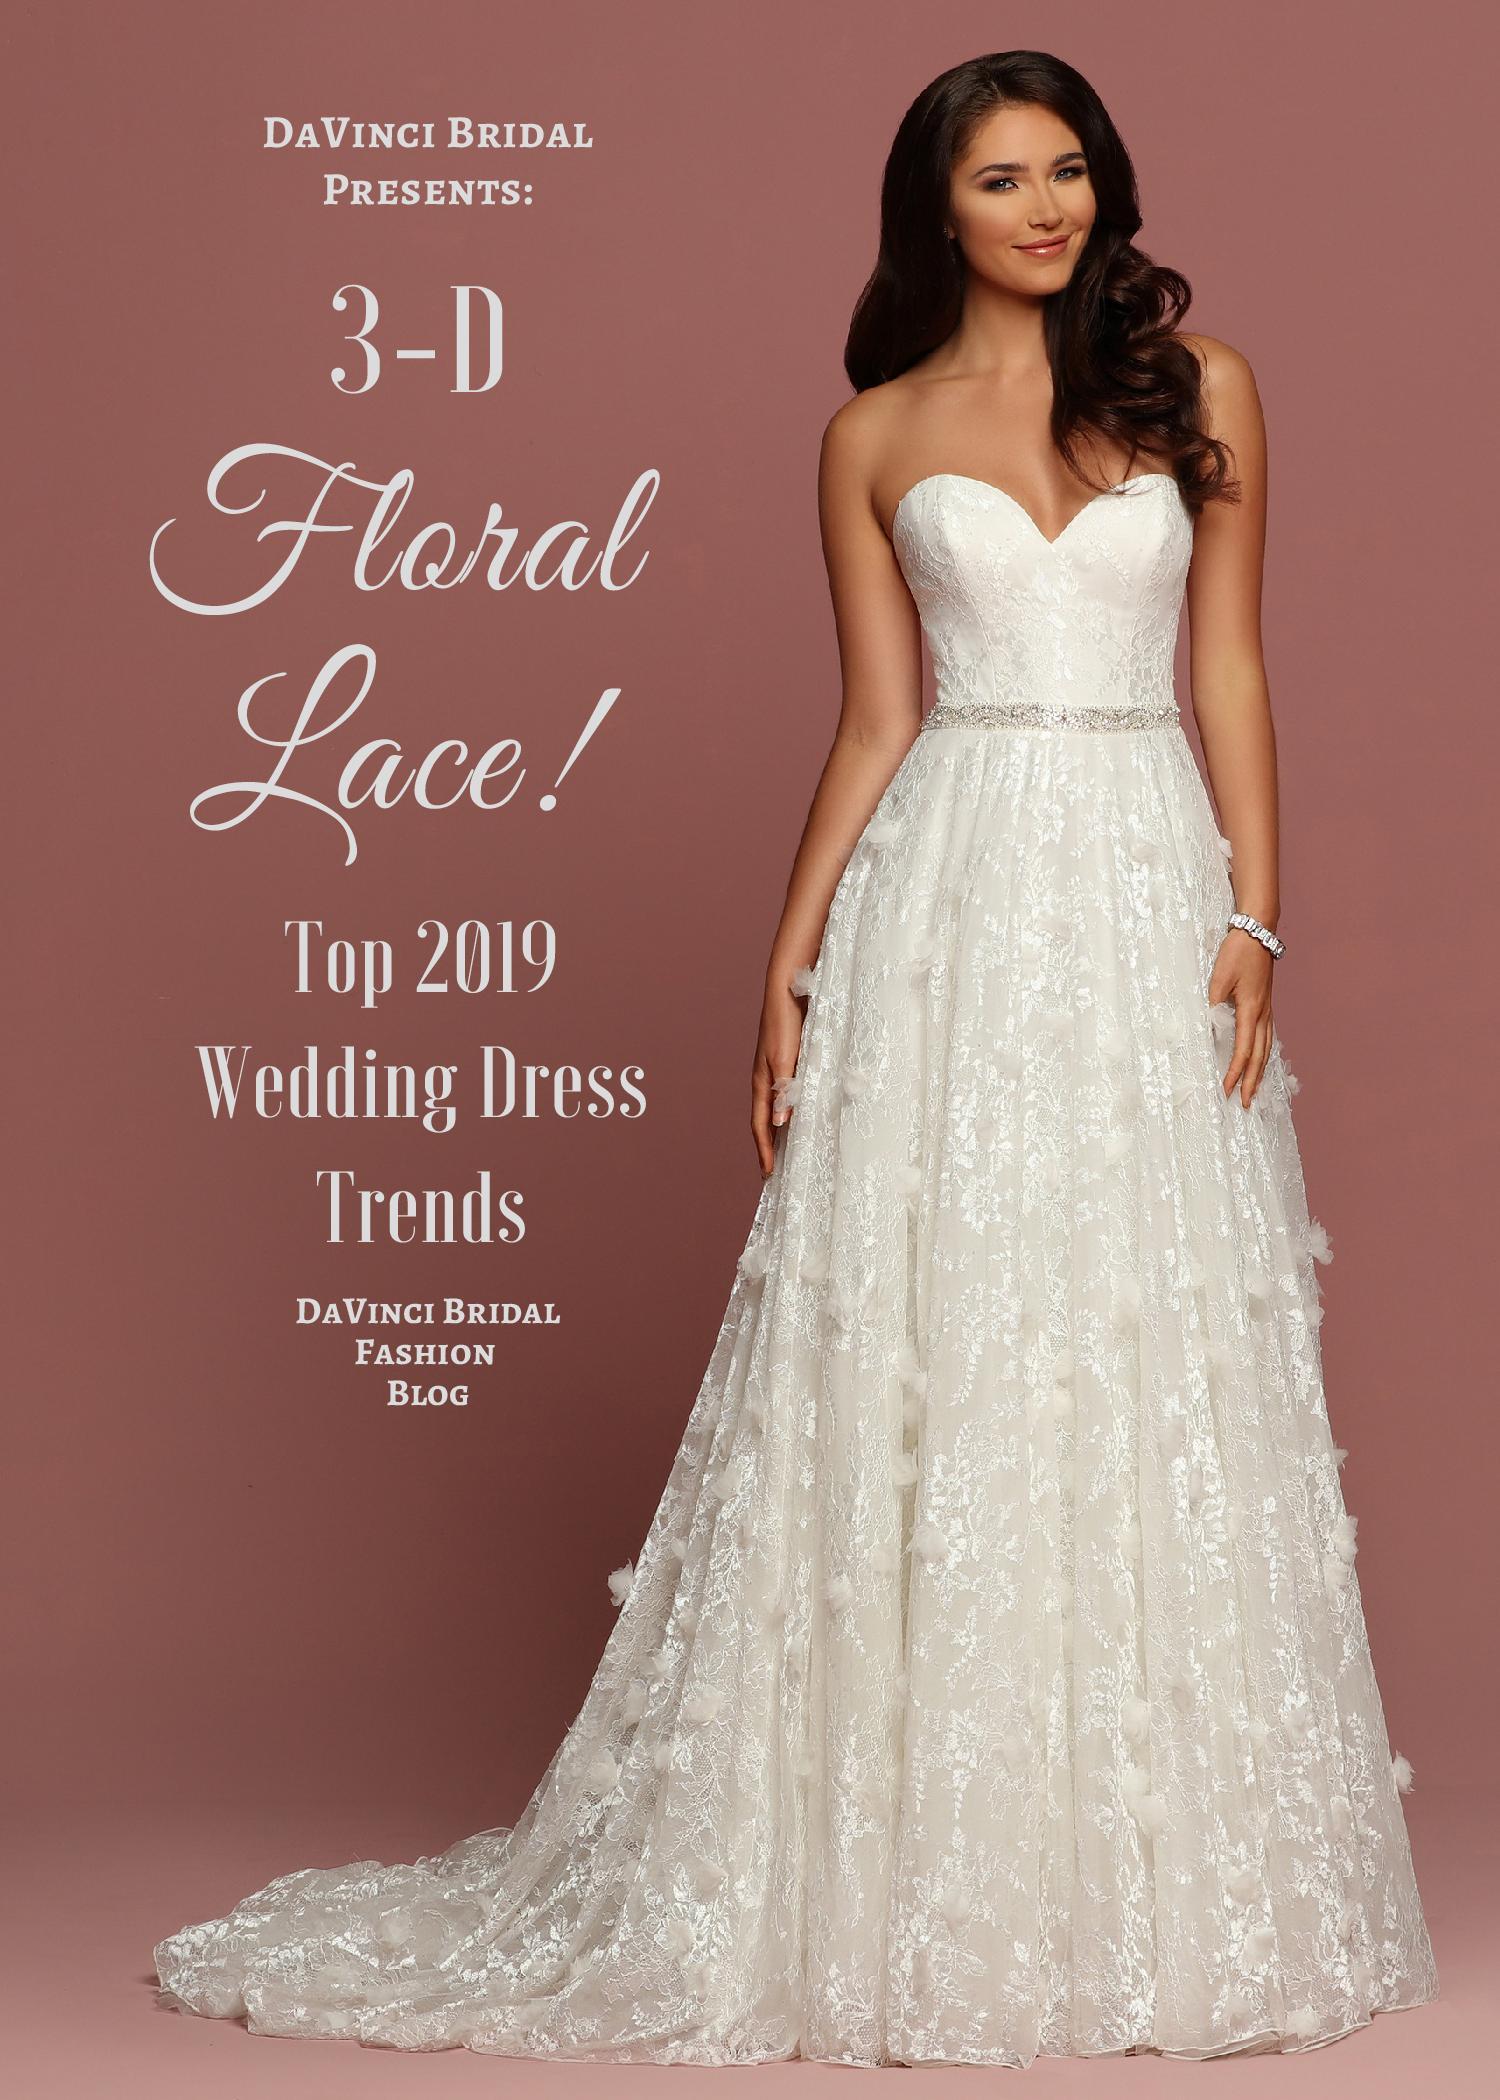 f7137873577 Top 2019 Wedding Dress Trends 3-D Floral Lace – DaVinci Bridal Fashion Blog